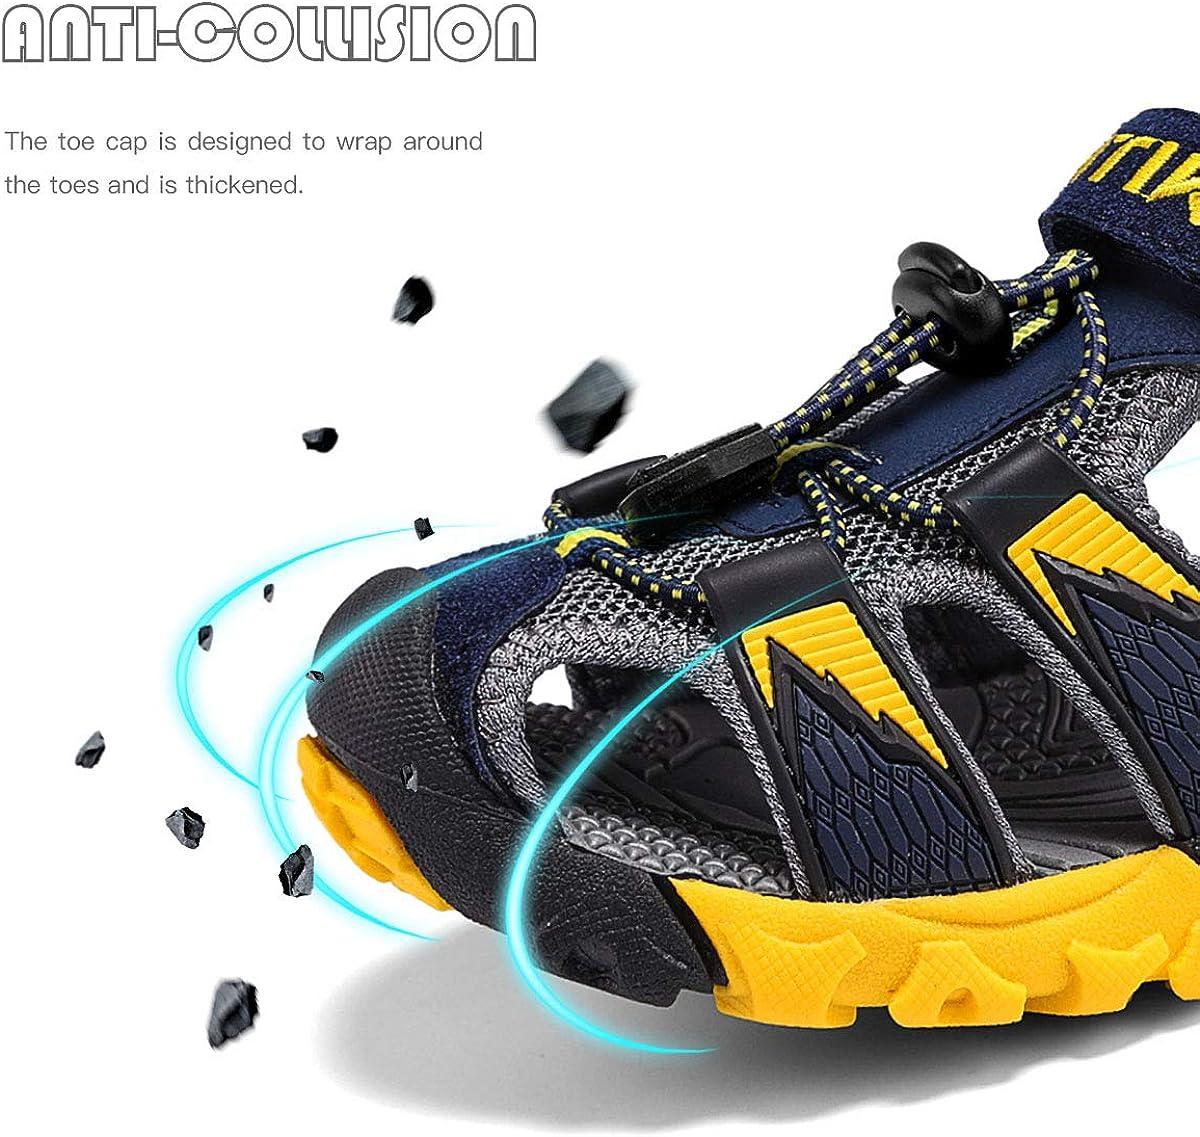 Kids Sandals Sports Outdoor Sandals Beach /& Pool Summer Sneakers Boys /& Girls